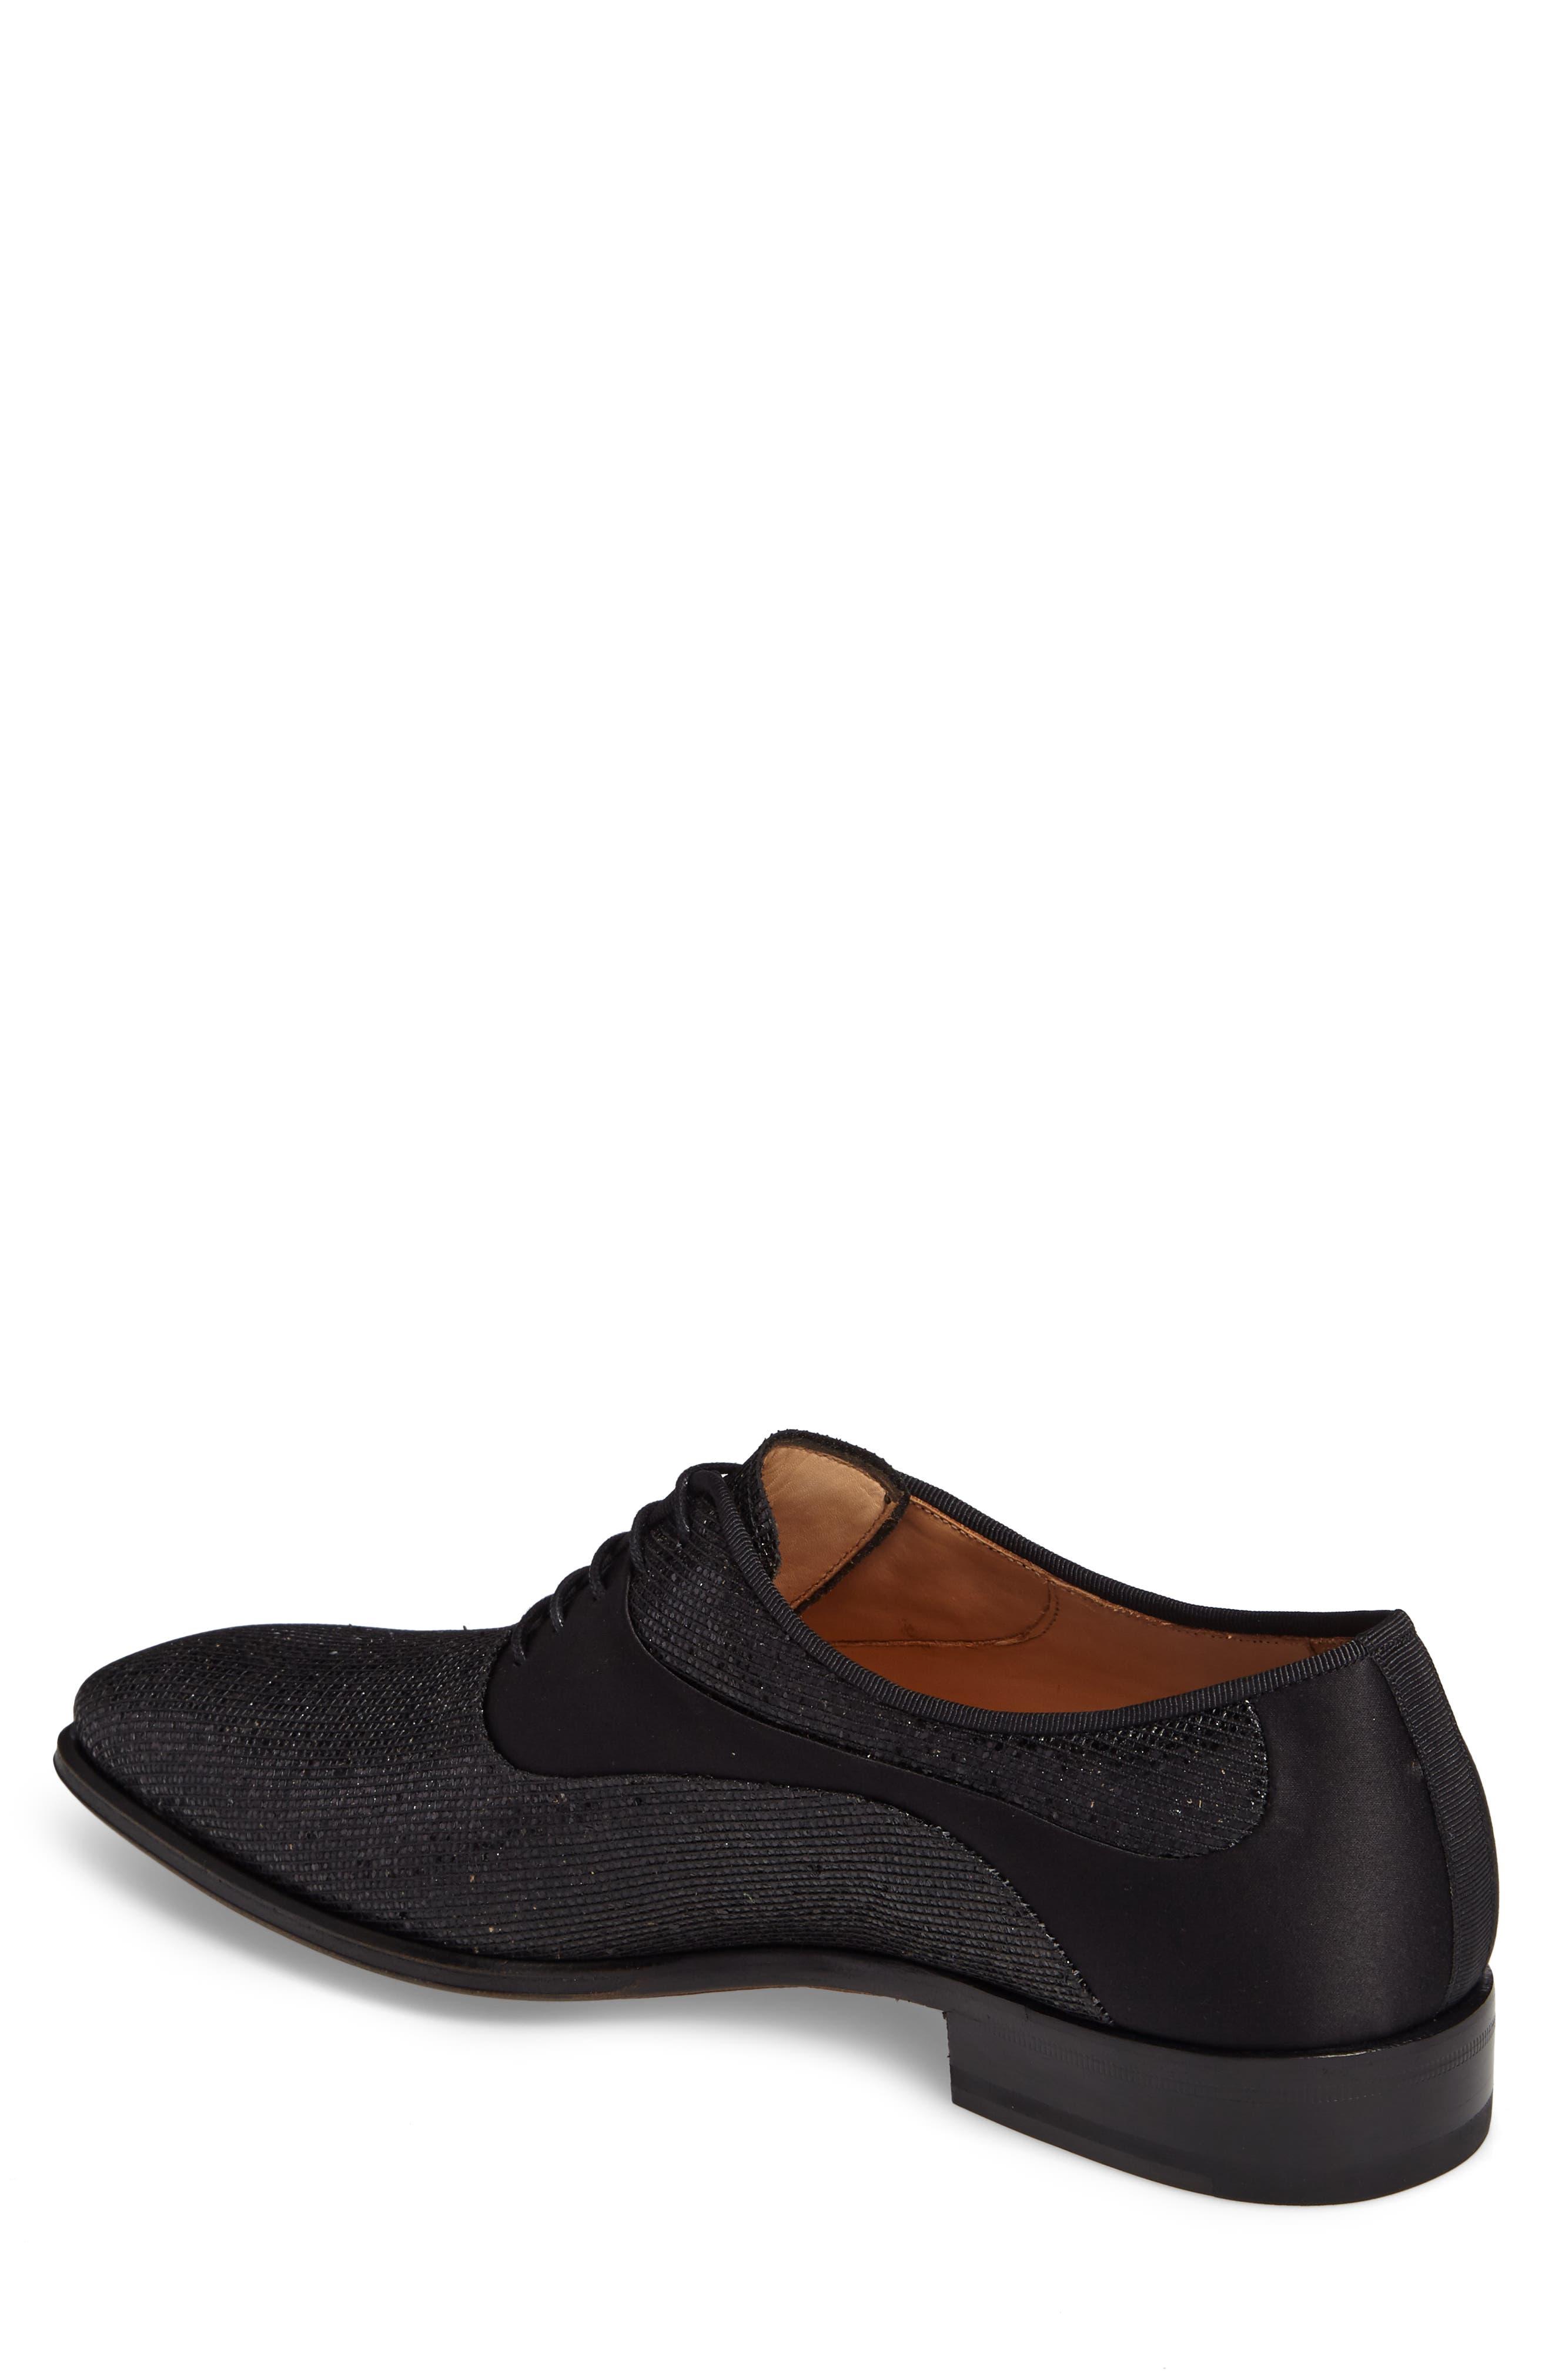 Honore Plain Toe Oxford,                             Alternate thumbnail 2, color,                             Black Suede